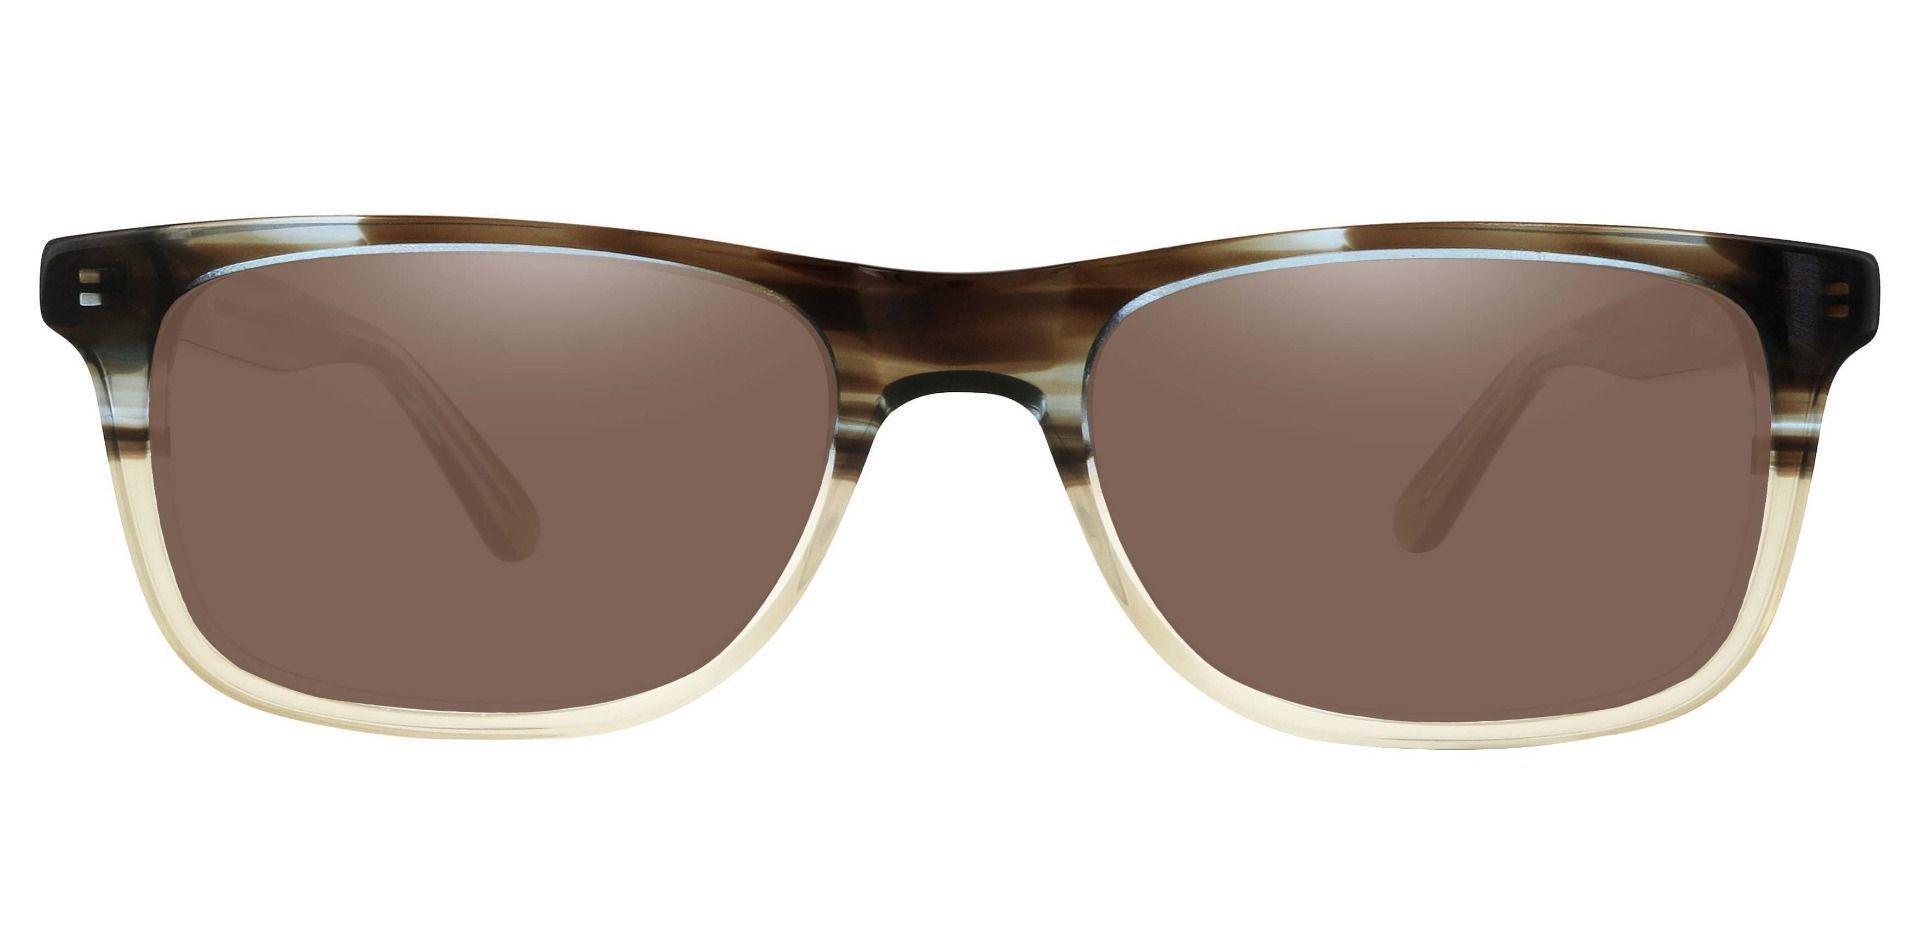 Denali Rectangle Non-Rx Sunglasses - Multi Color Frame With Brown Lenses